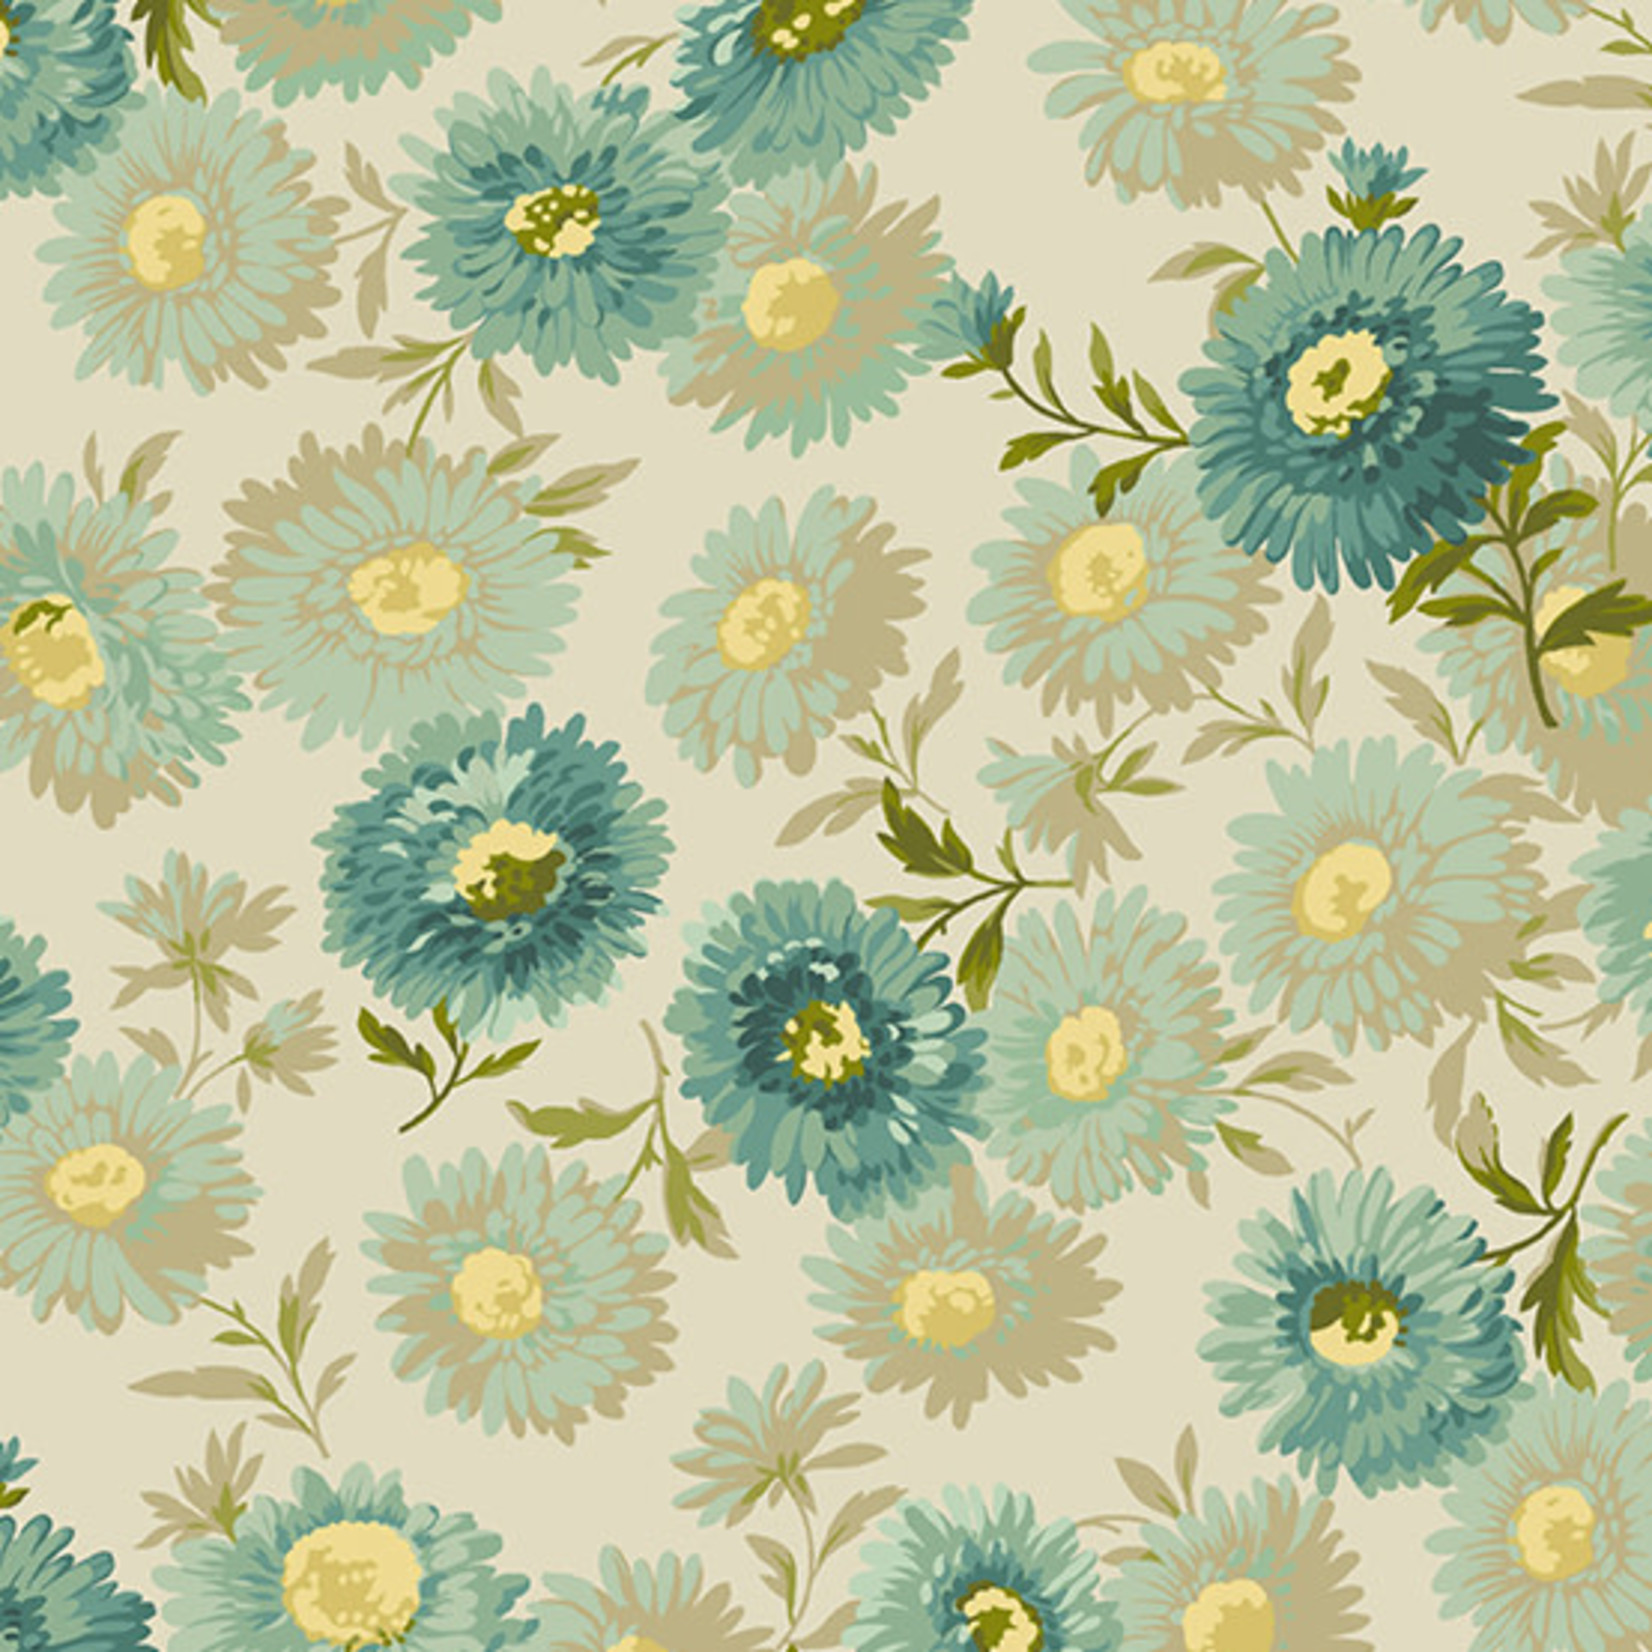 Edyta Sitar Secret Stash - Neutrals, Daisies, Teal (8751-T) $0.20 per cm or $20/m